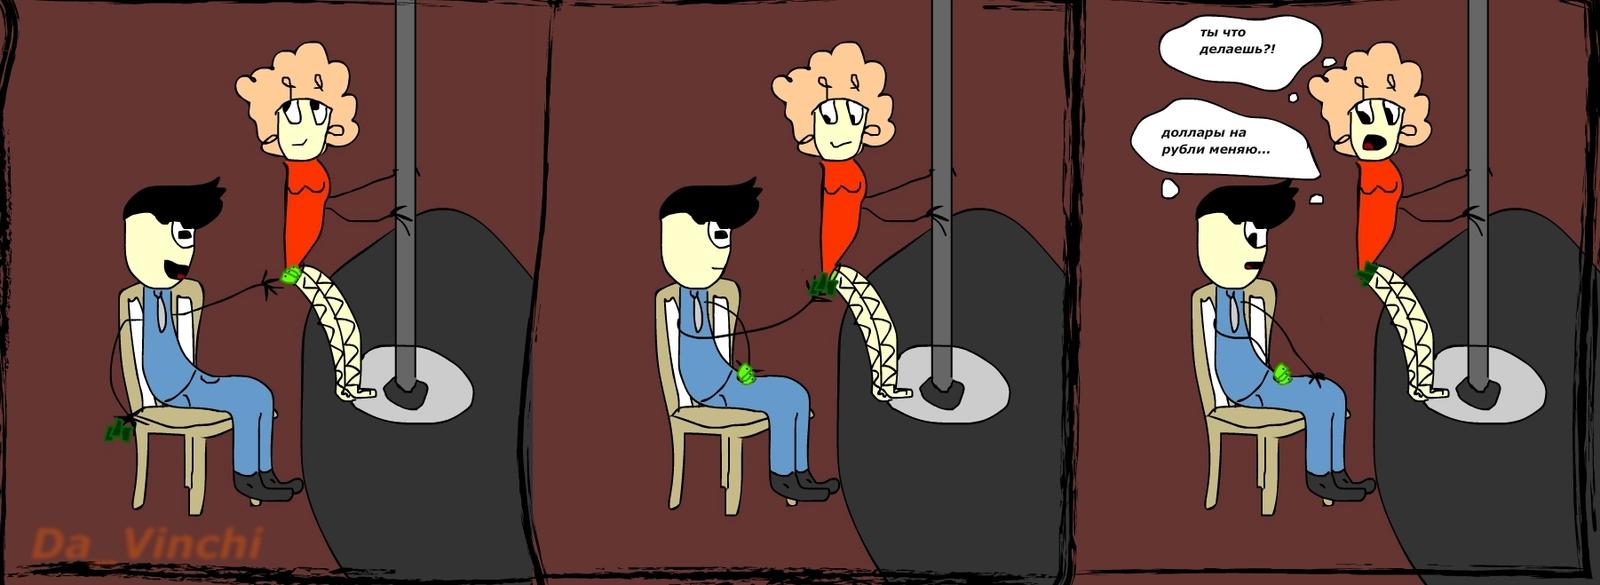 Мульт стрип клуб ночной клуб во владивостоке арена